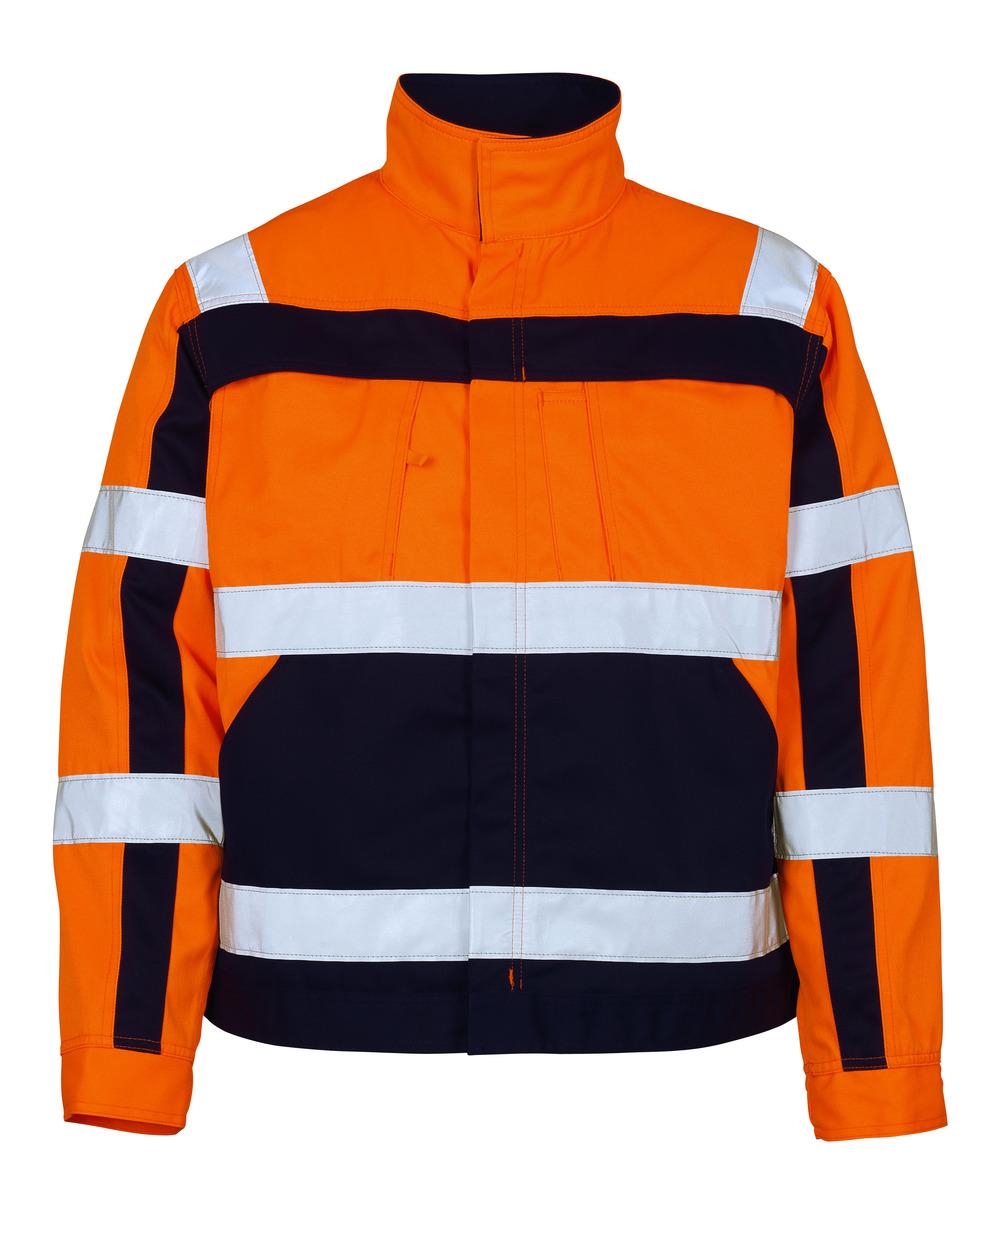 07109-860-141 Jacket - hi-vis orange/navy